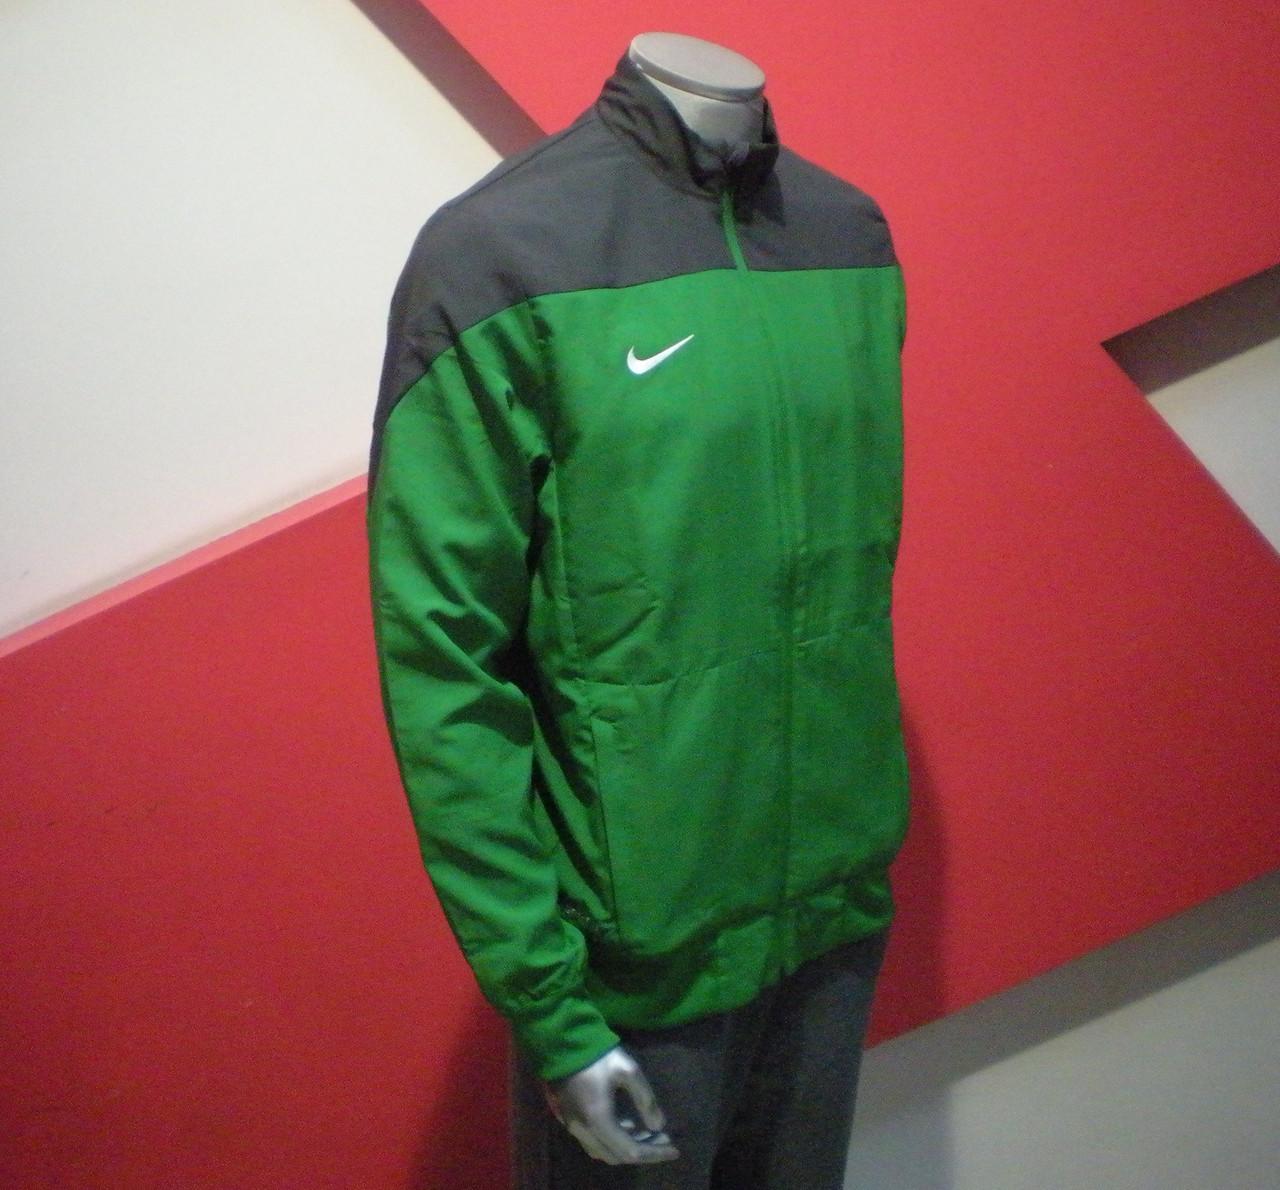 e4cbac09 ... Мужская спортивная олимпийка Nike Squad 14 Knit Training Jacket, ...